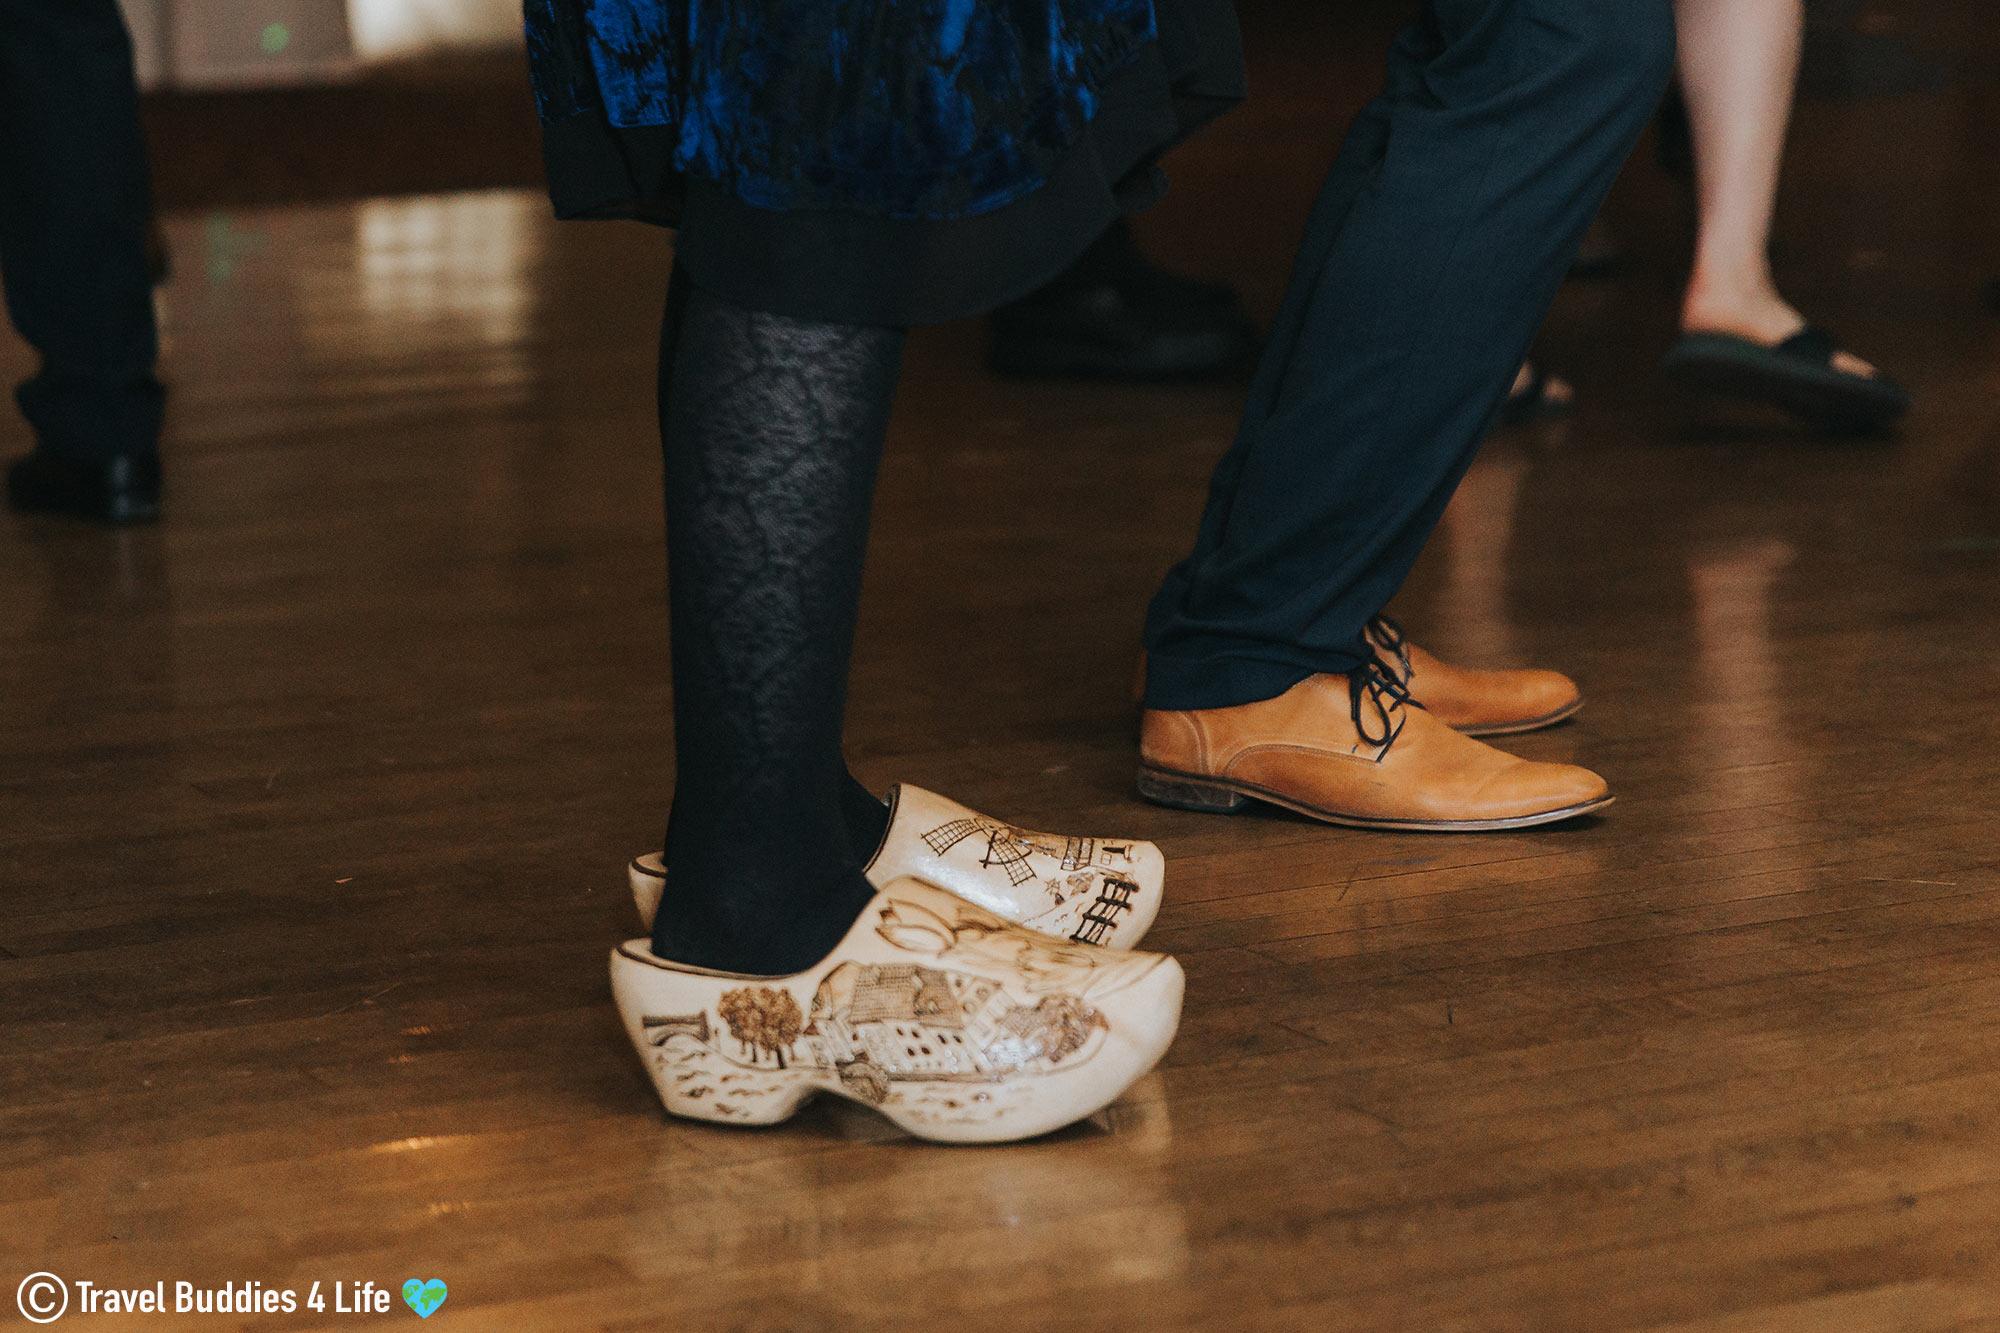 Dutch Wooden Wedding Clogs On The Feet Of A Dancer In Canada